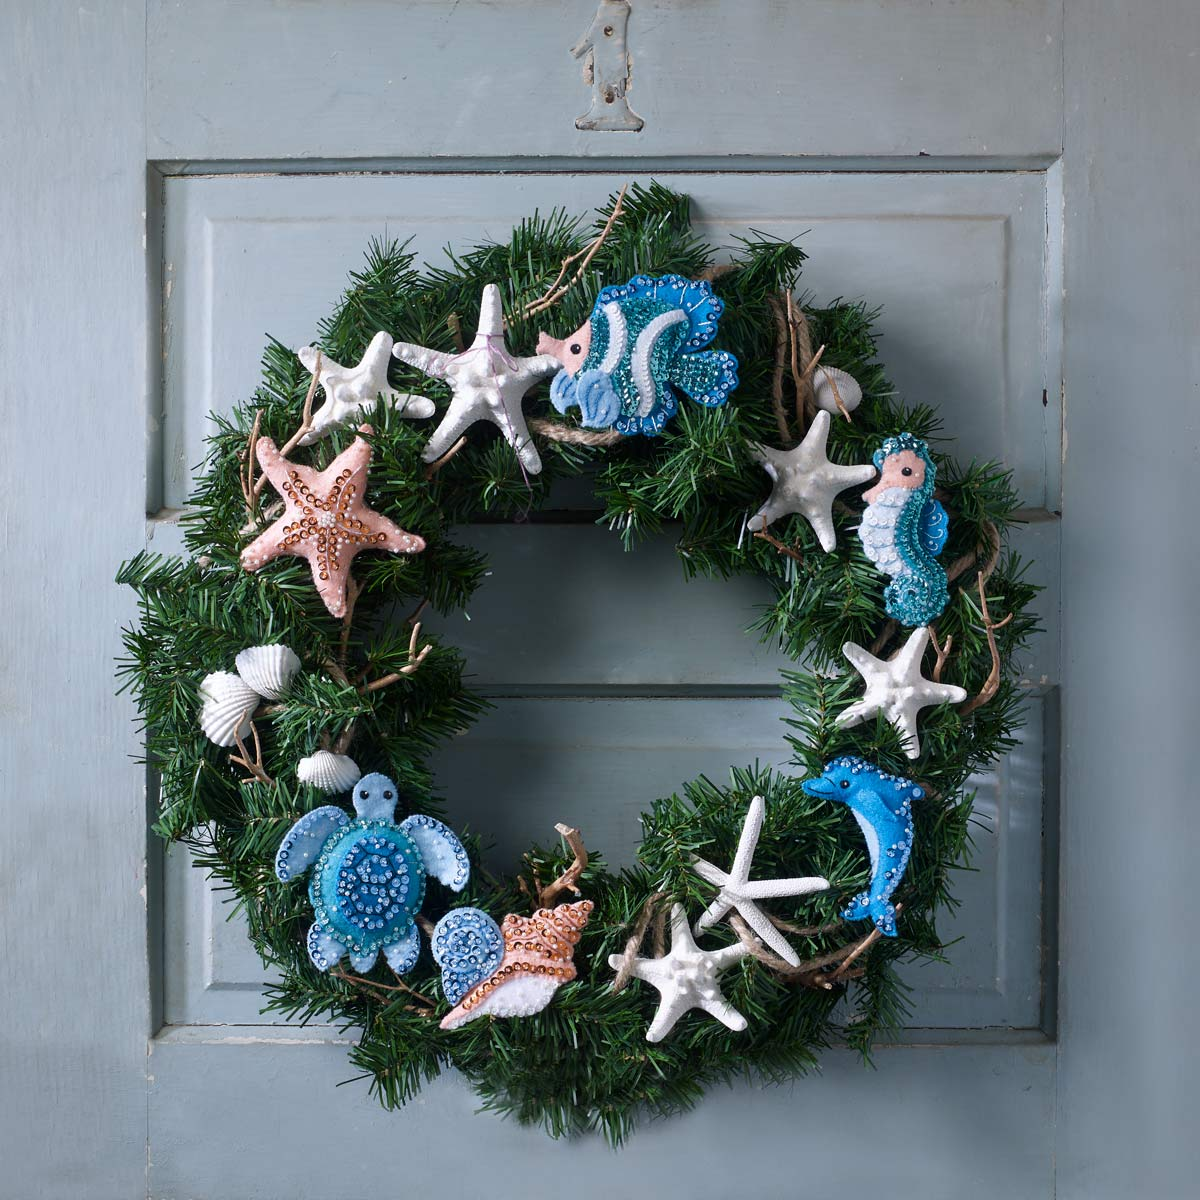 Bucilla ® Seasonal - Felt - Ornament Kits - Under the Sea